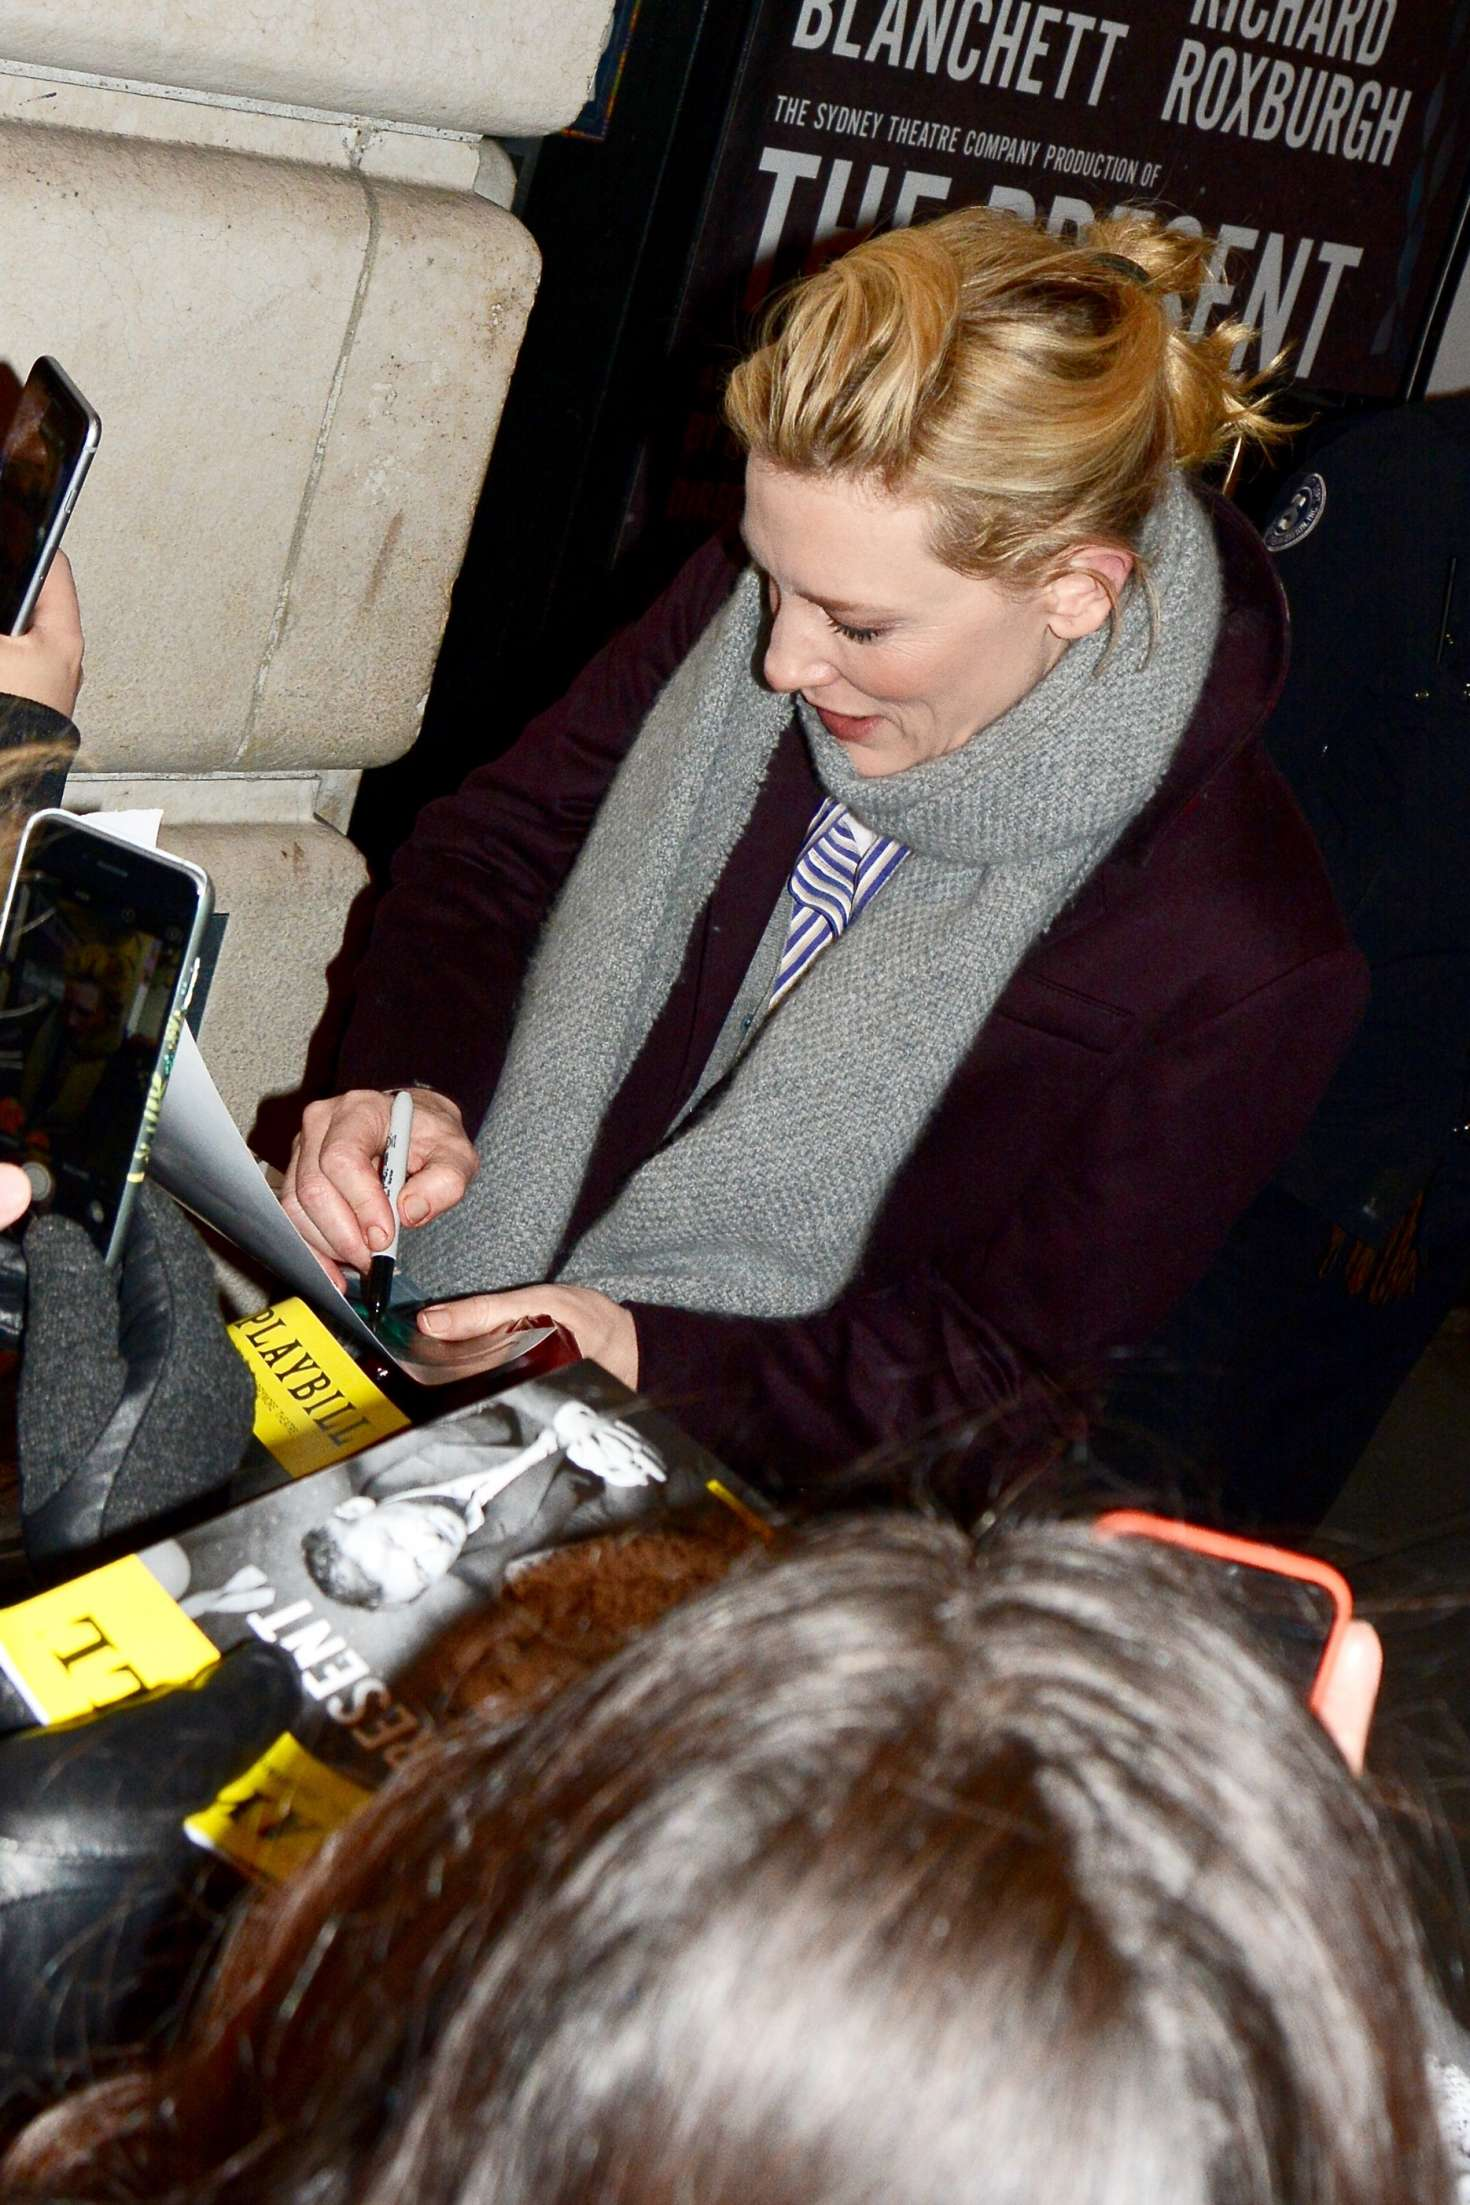 Cate Blanchett 2017 : Cate Blanchett: Meets fans after her broadway performance -08